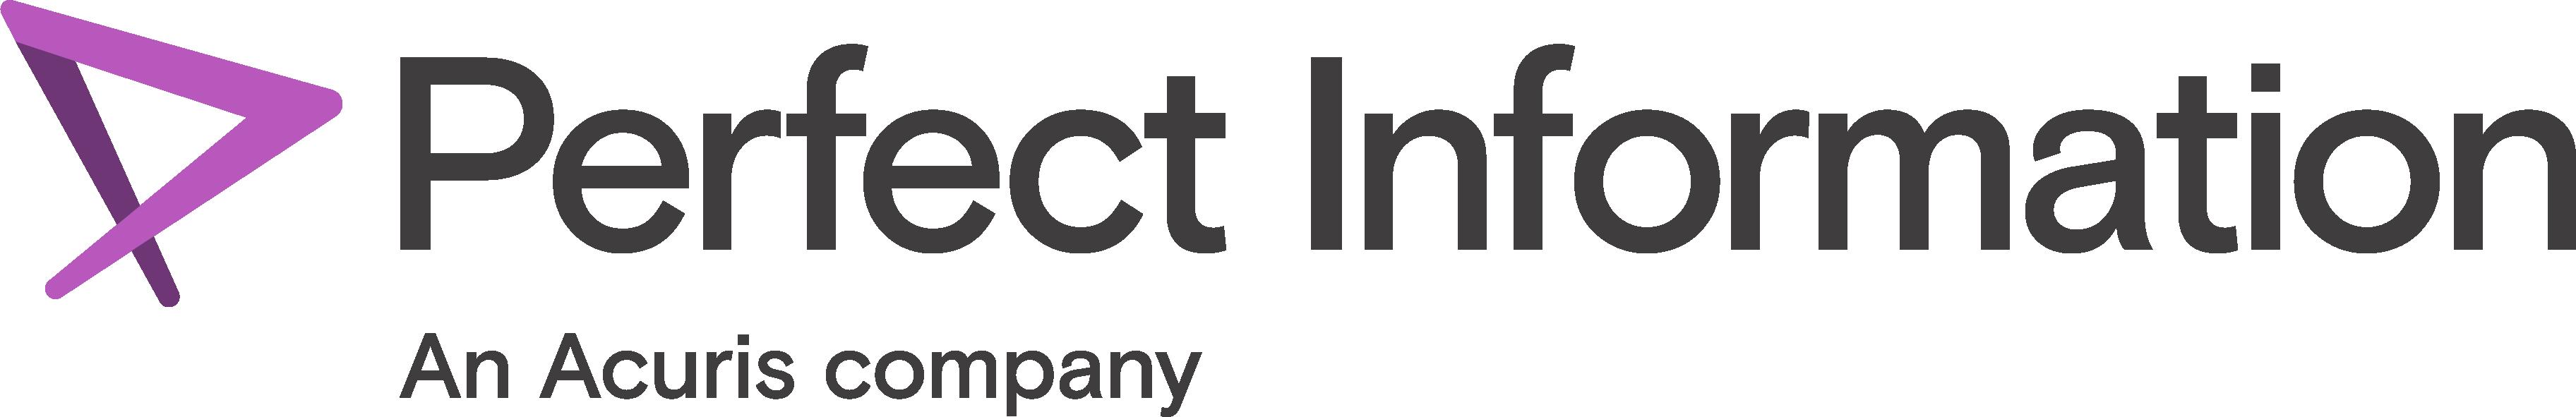 Perfect Information logo